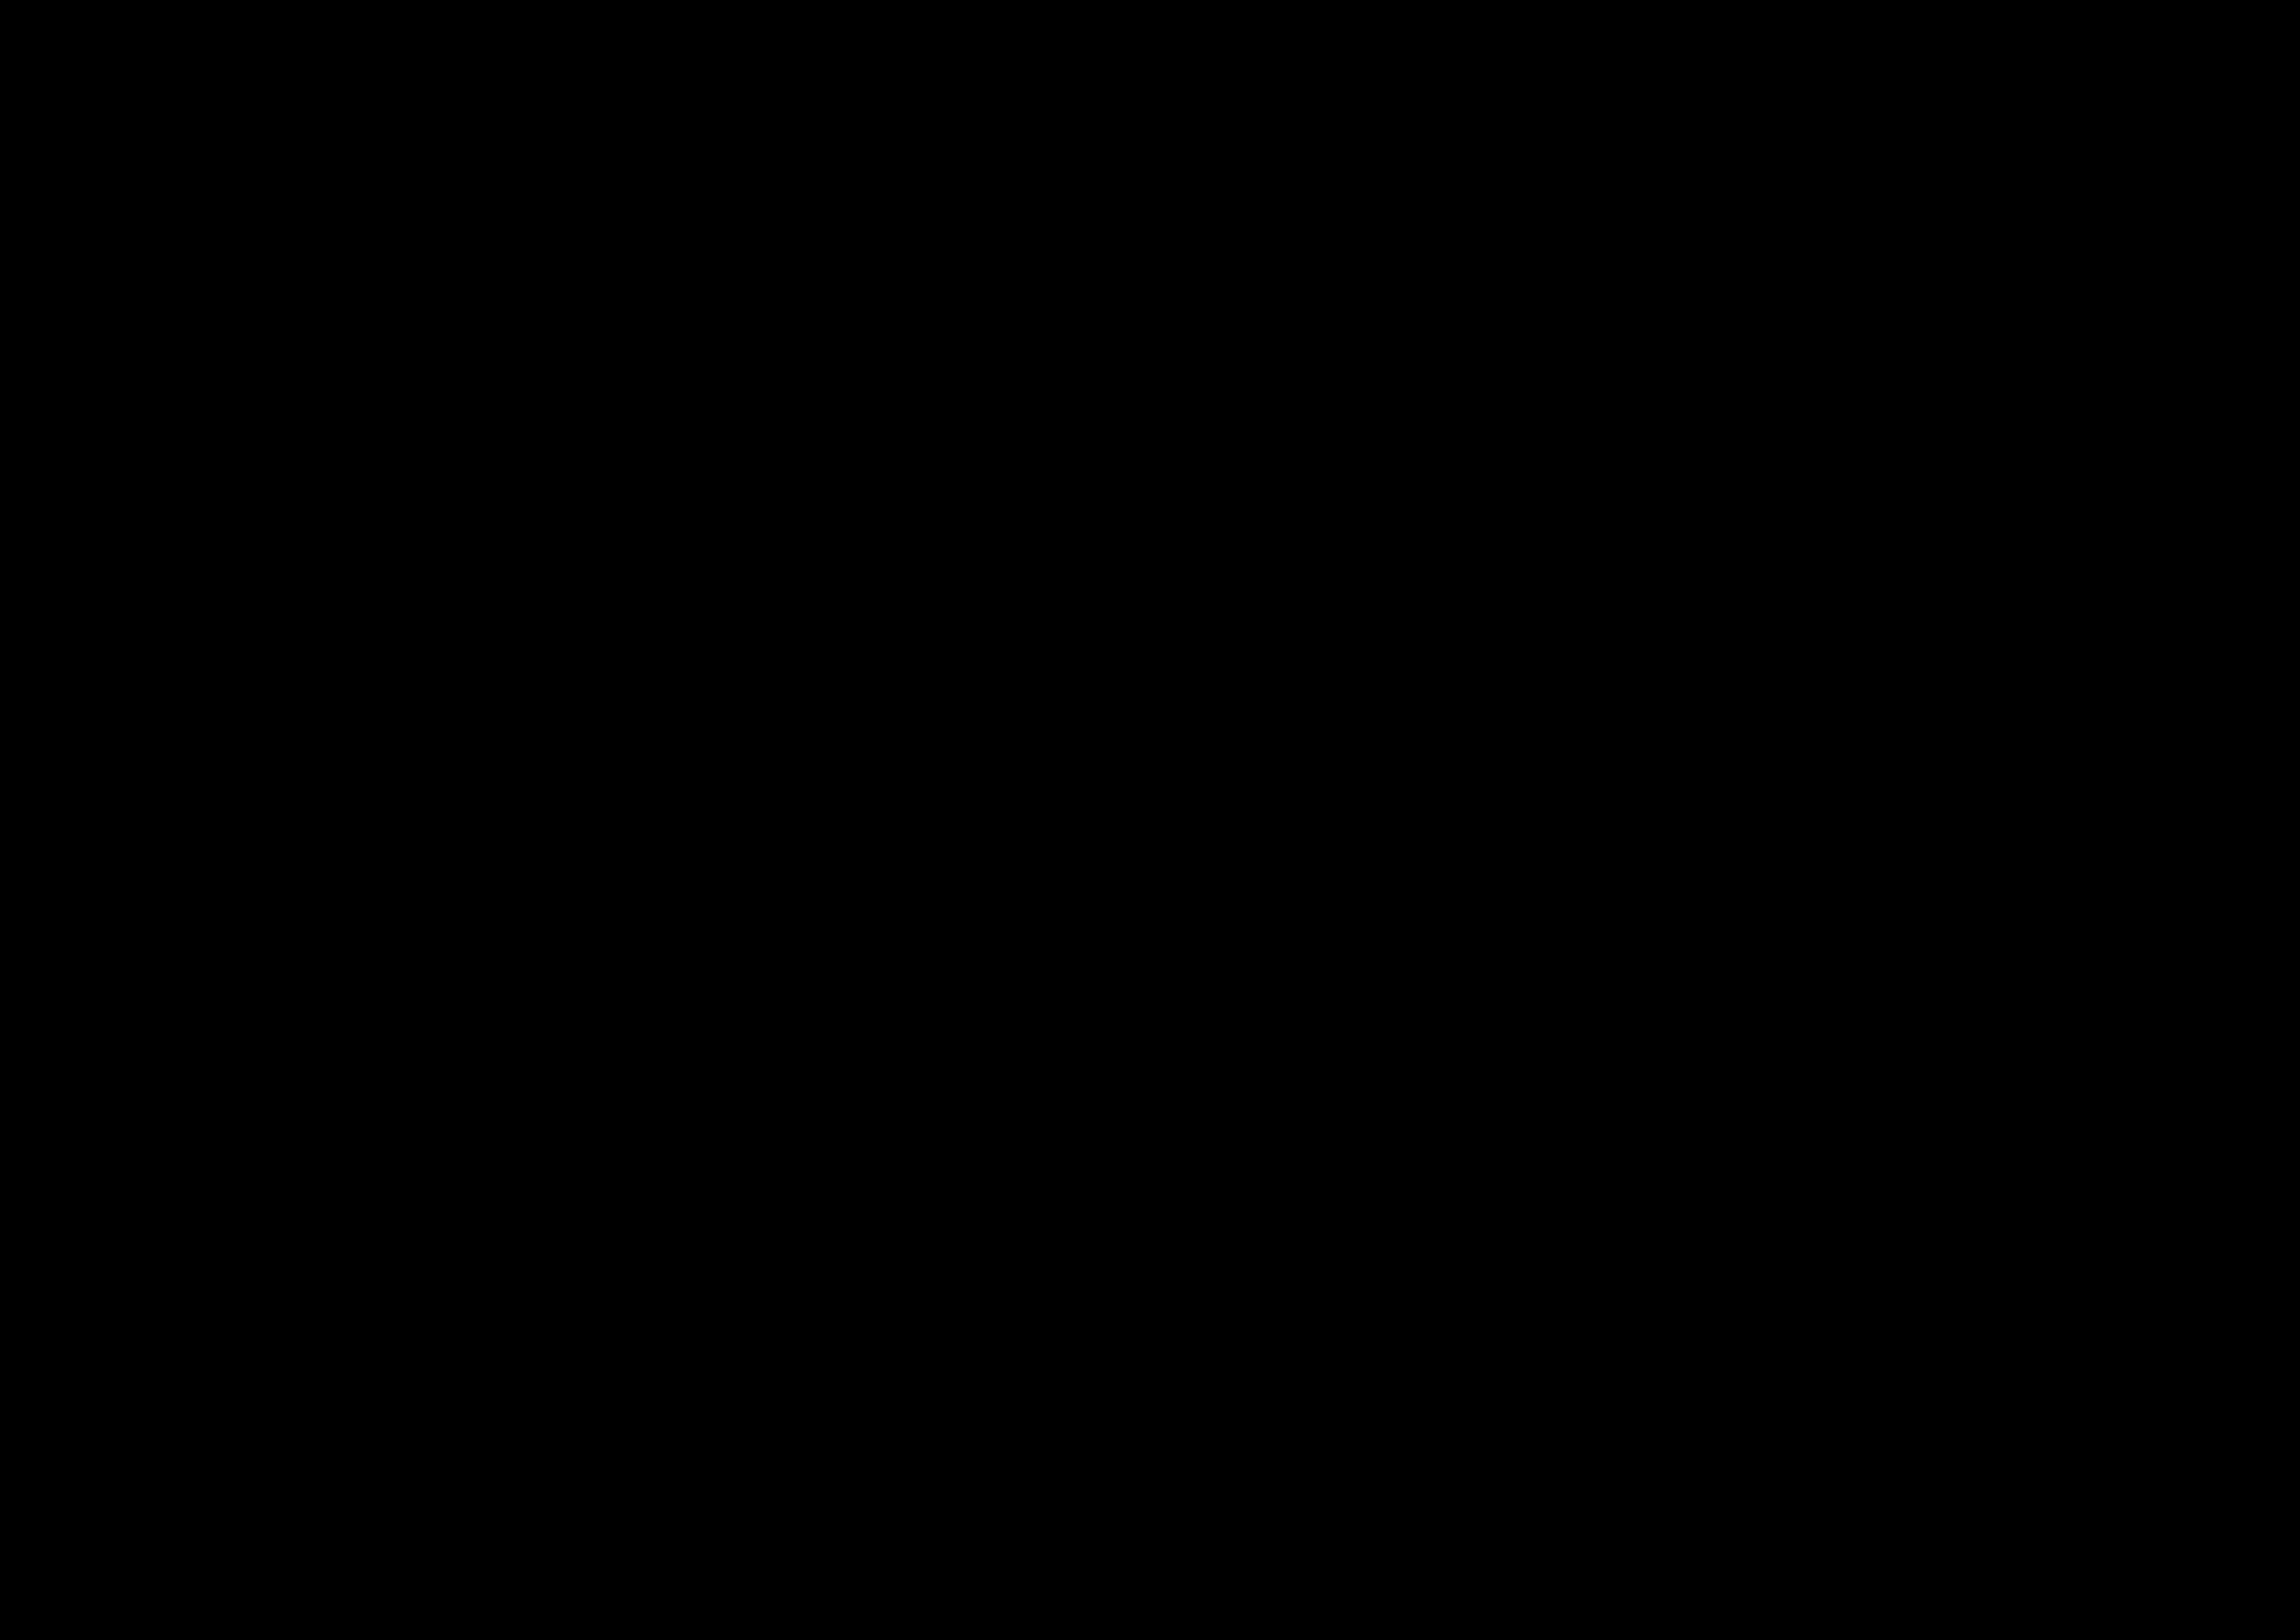 vlf_logo-black